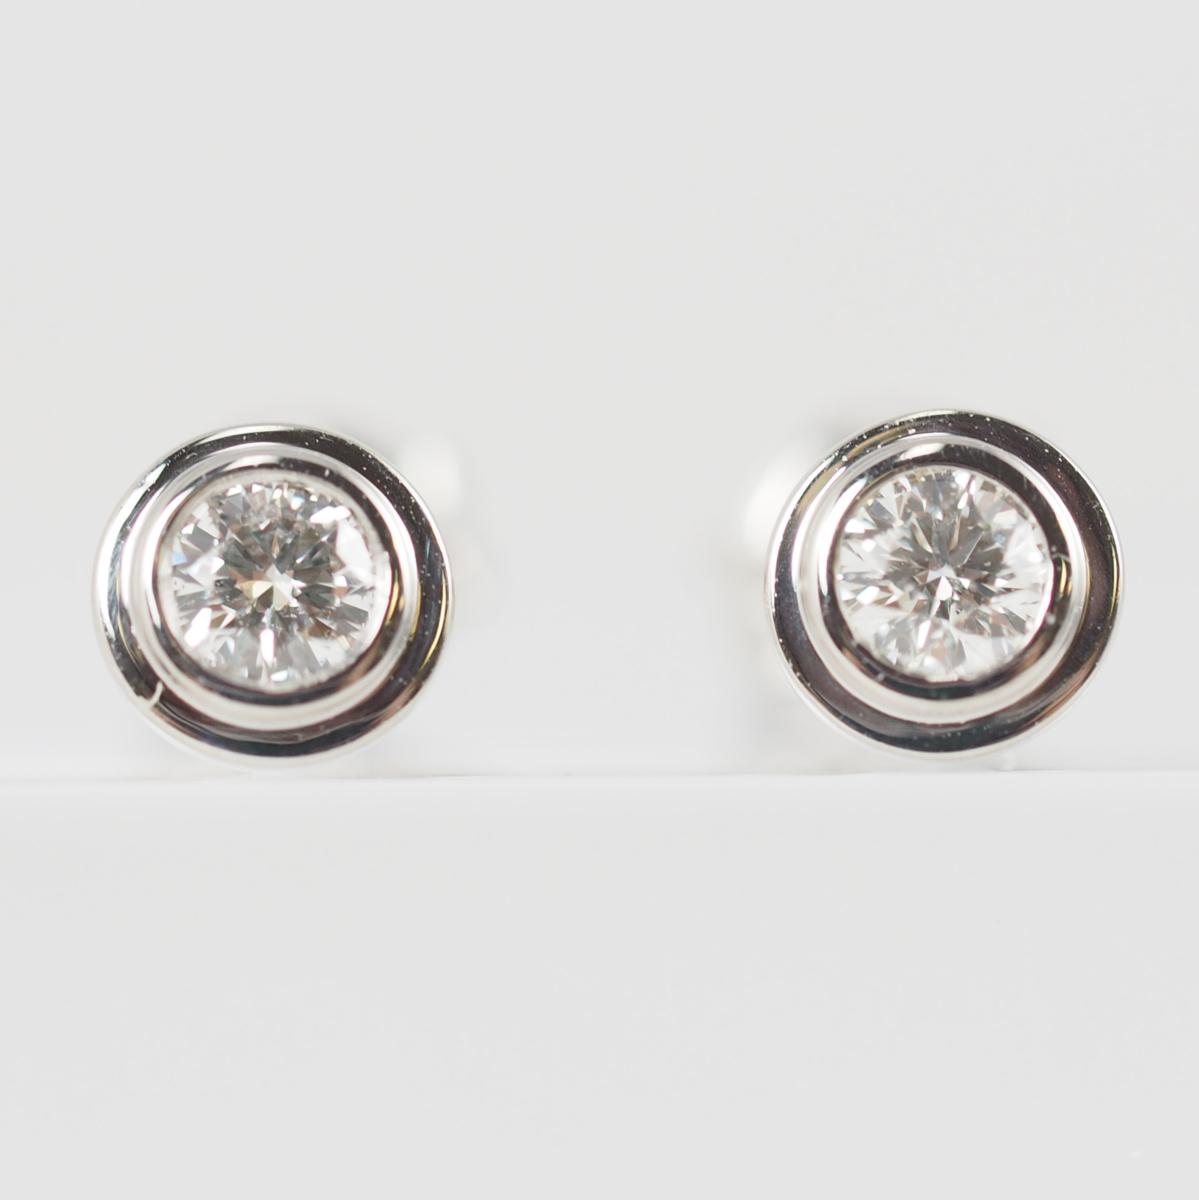 VENDOME AOYAMA ヴァンドーム青山 1粒ダイヤモンド(石目なし) Pt950/900 ピアス [22832]_画像1